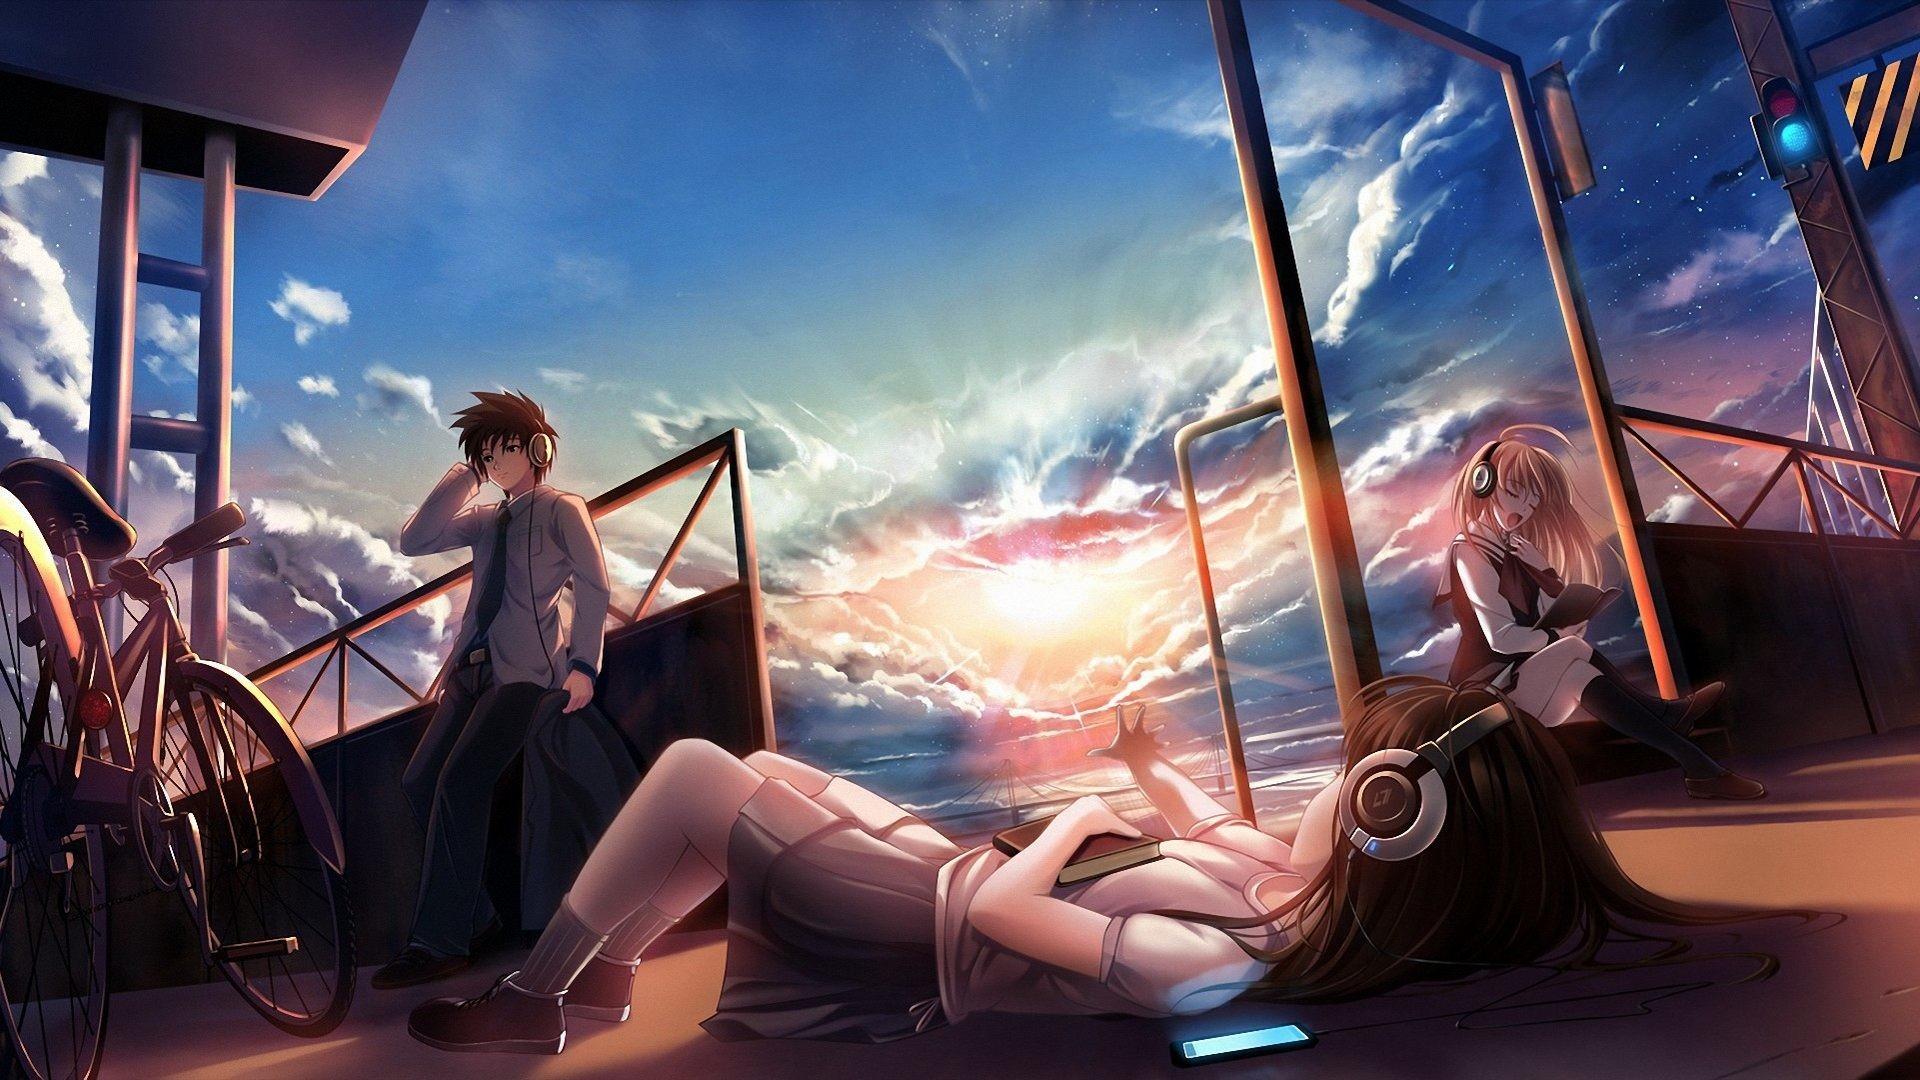 Anime Wallpaper Music Awb268